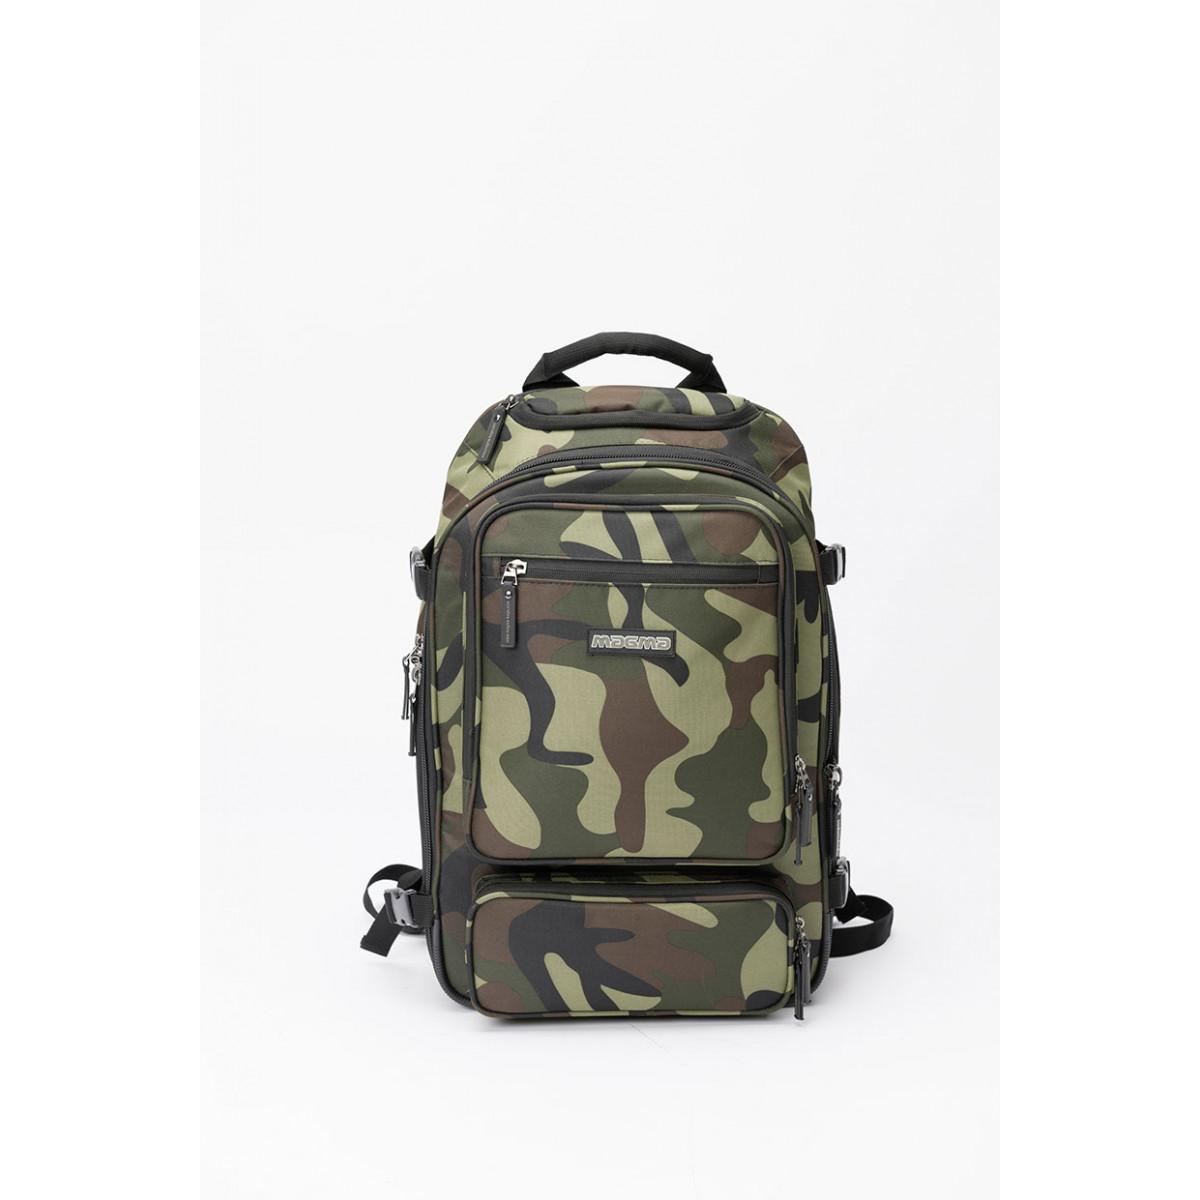 33b424fe27 Magma DIGI DJ-BACKPACK universal τσάντα πλάτης σε χρώμα παραλλαγής